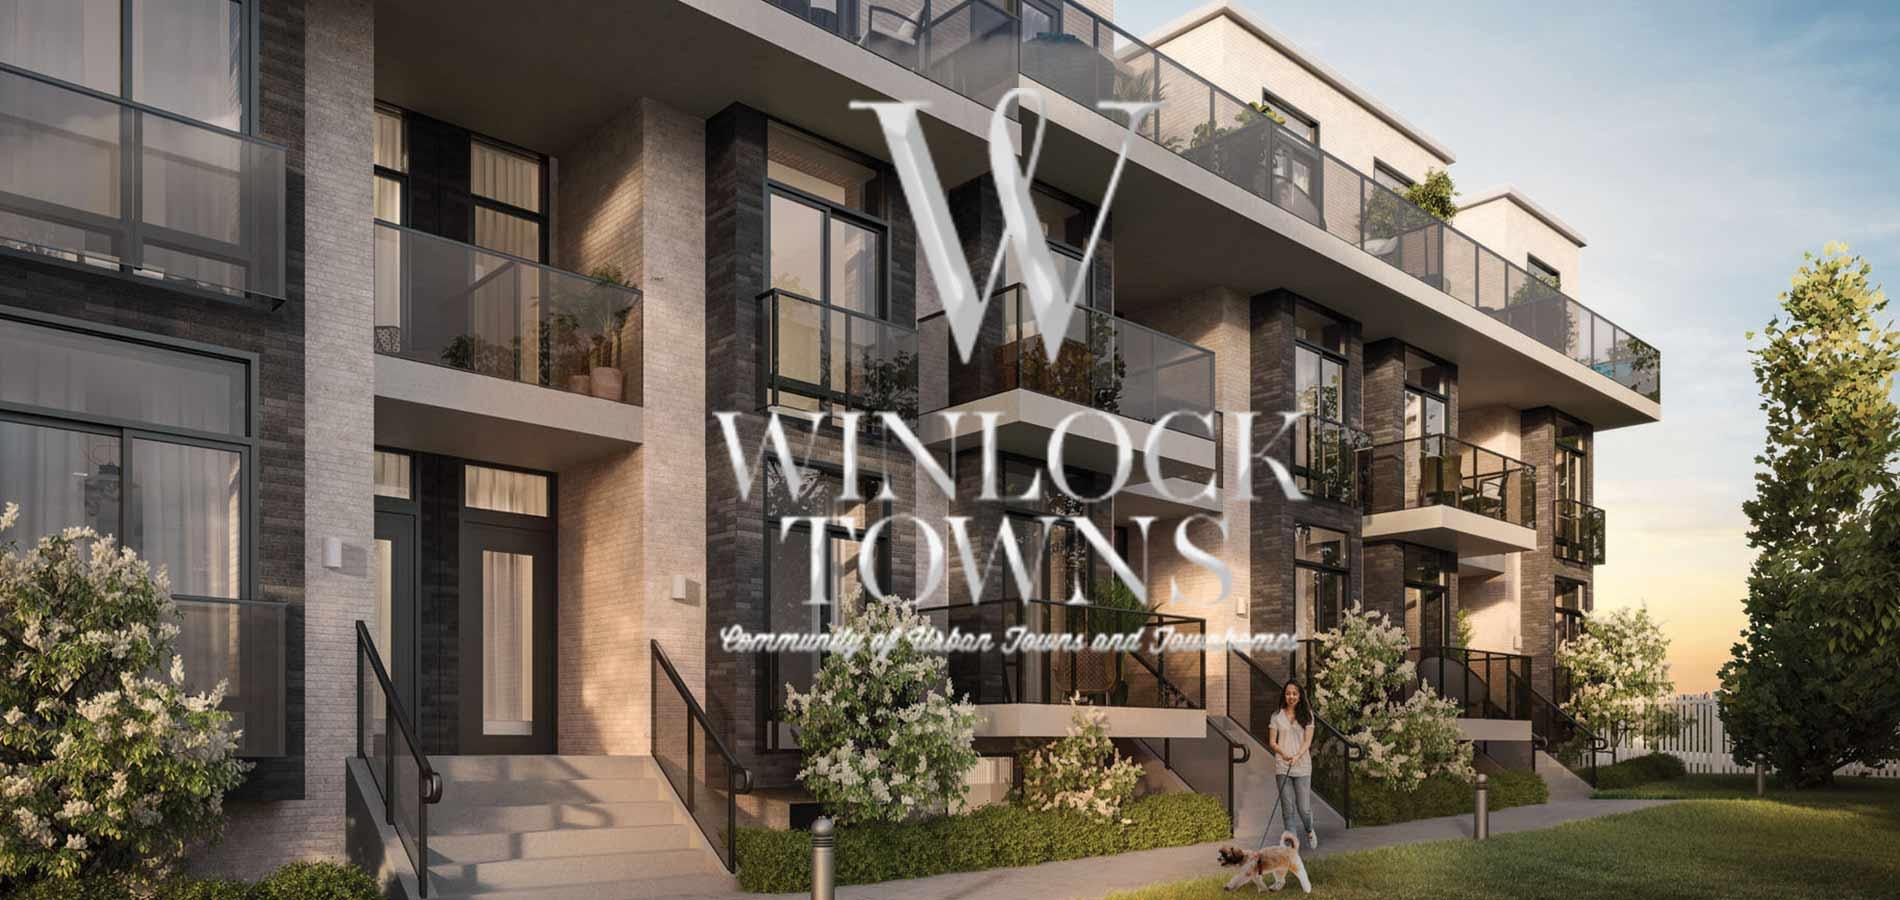 Winlock towns